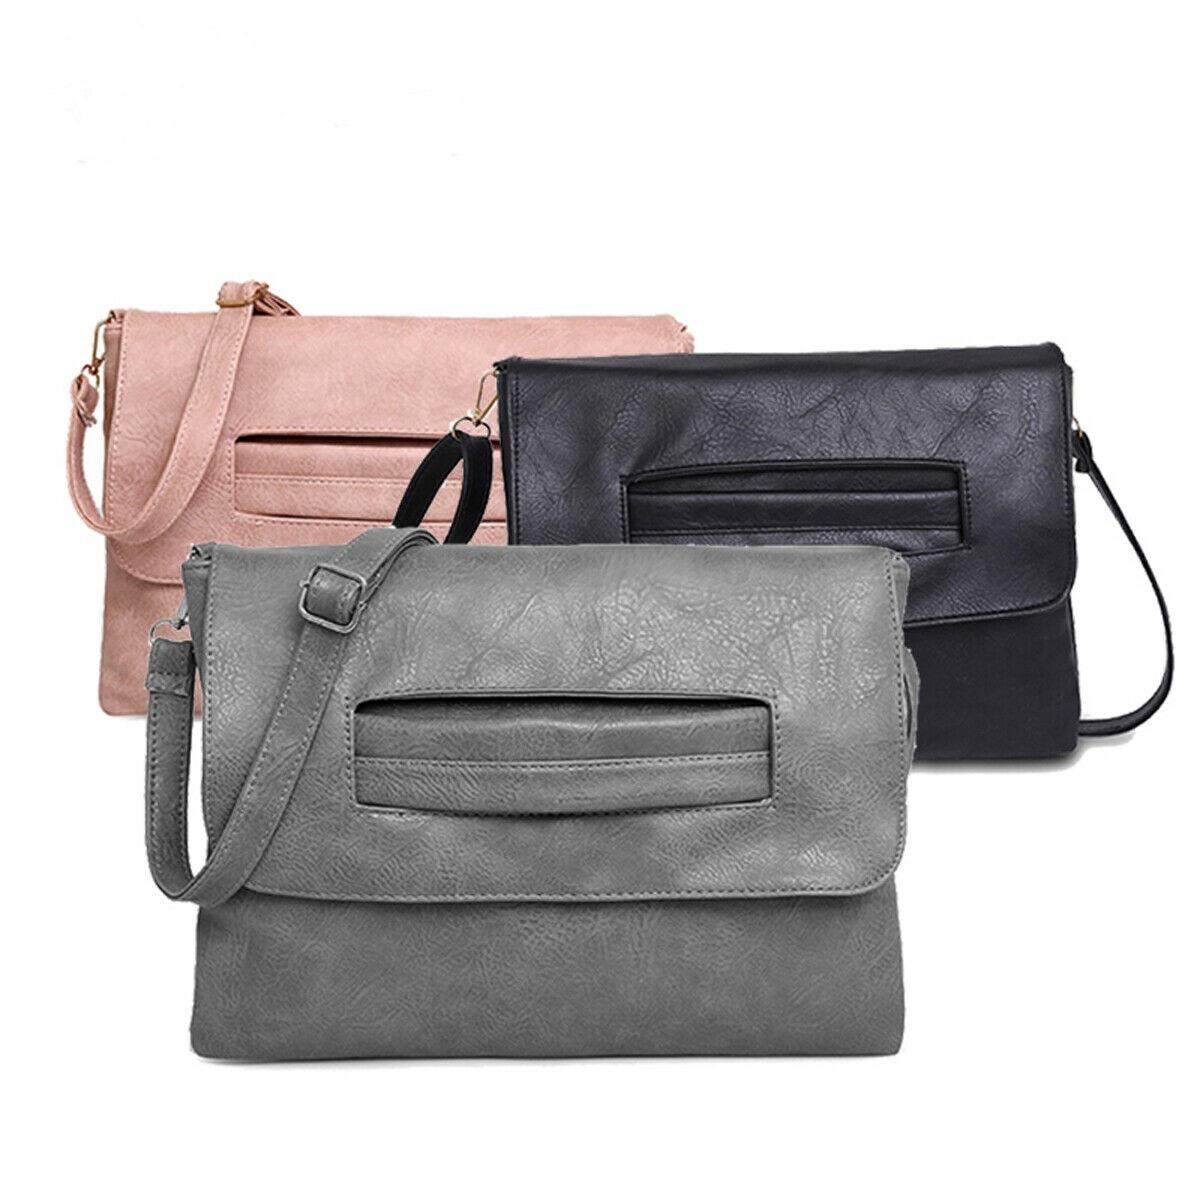 Women Lady Leather Handbag Cross Body Shoulder Travel Bag Tote Purse Messenger Satchel